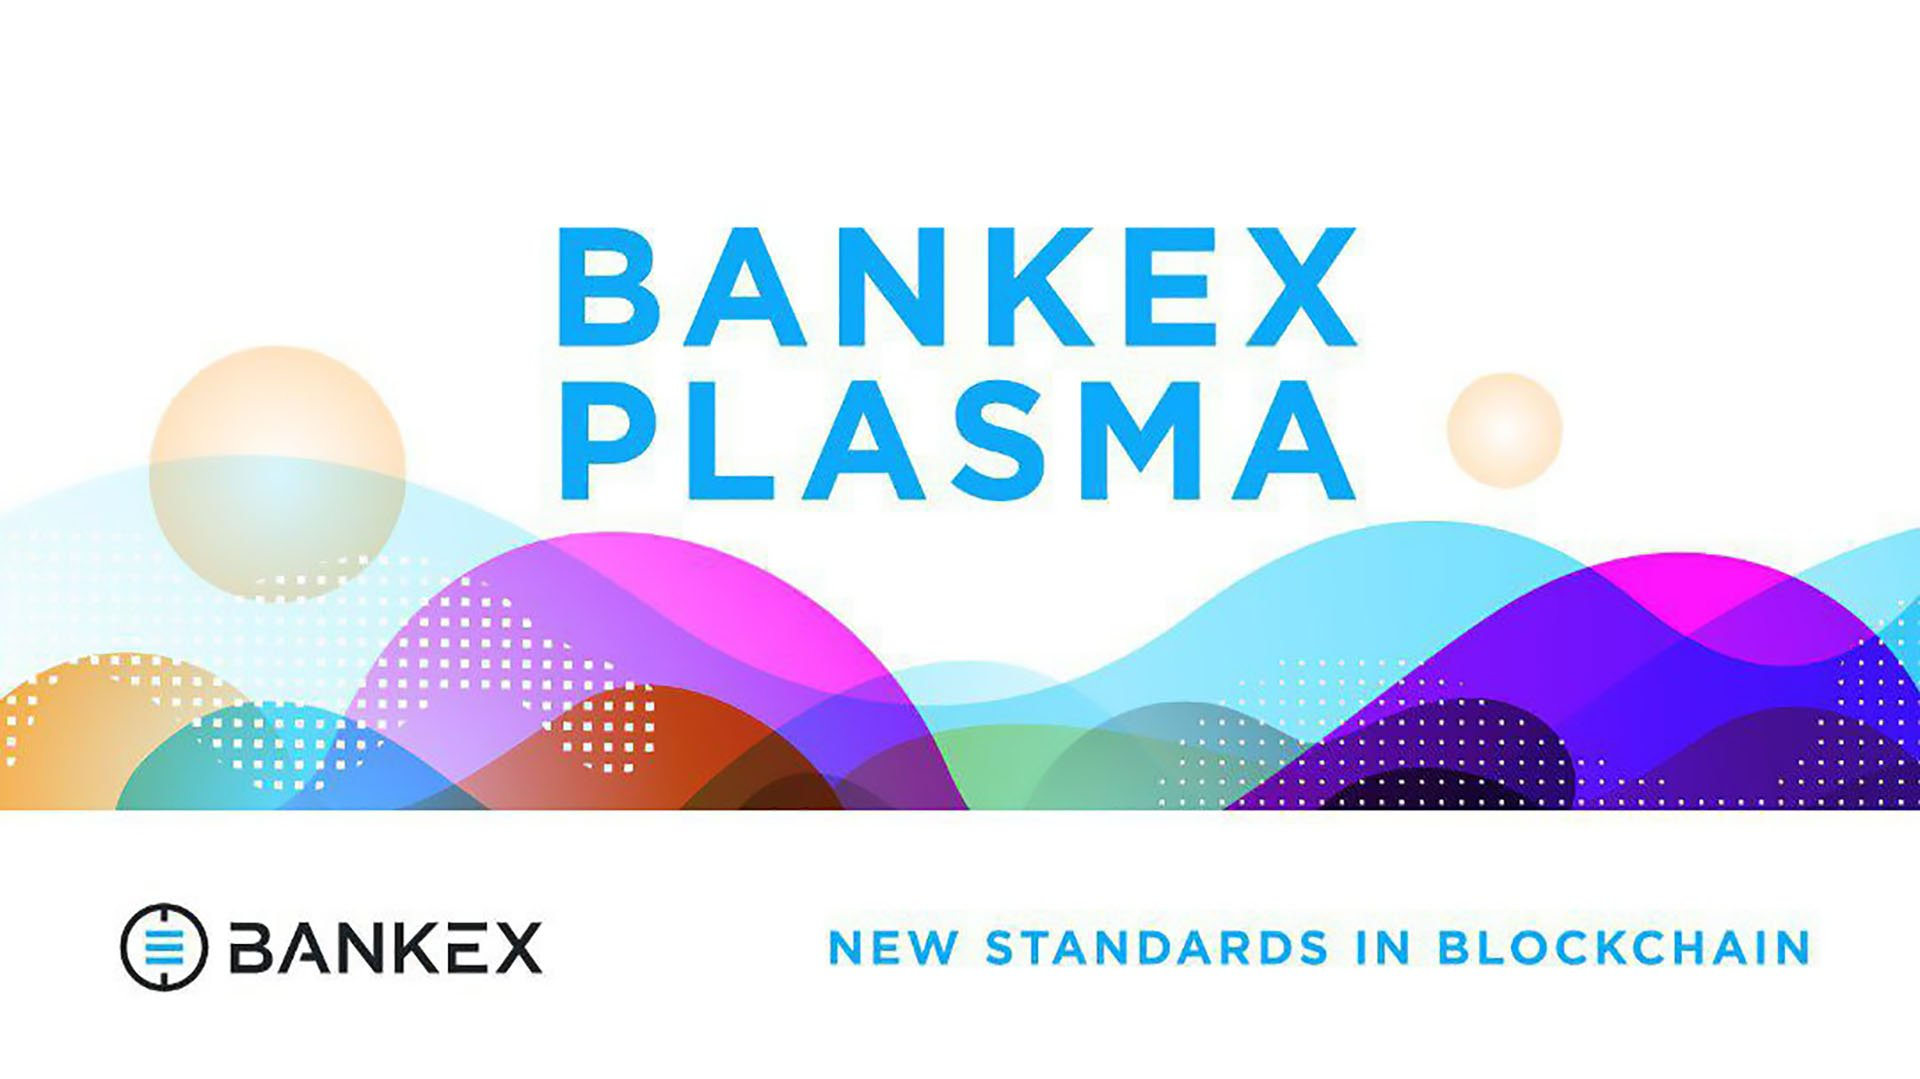 BANKEX Plasma Protocol Reports 22k Transactions per Second